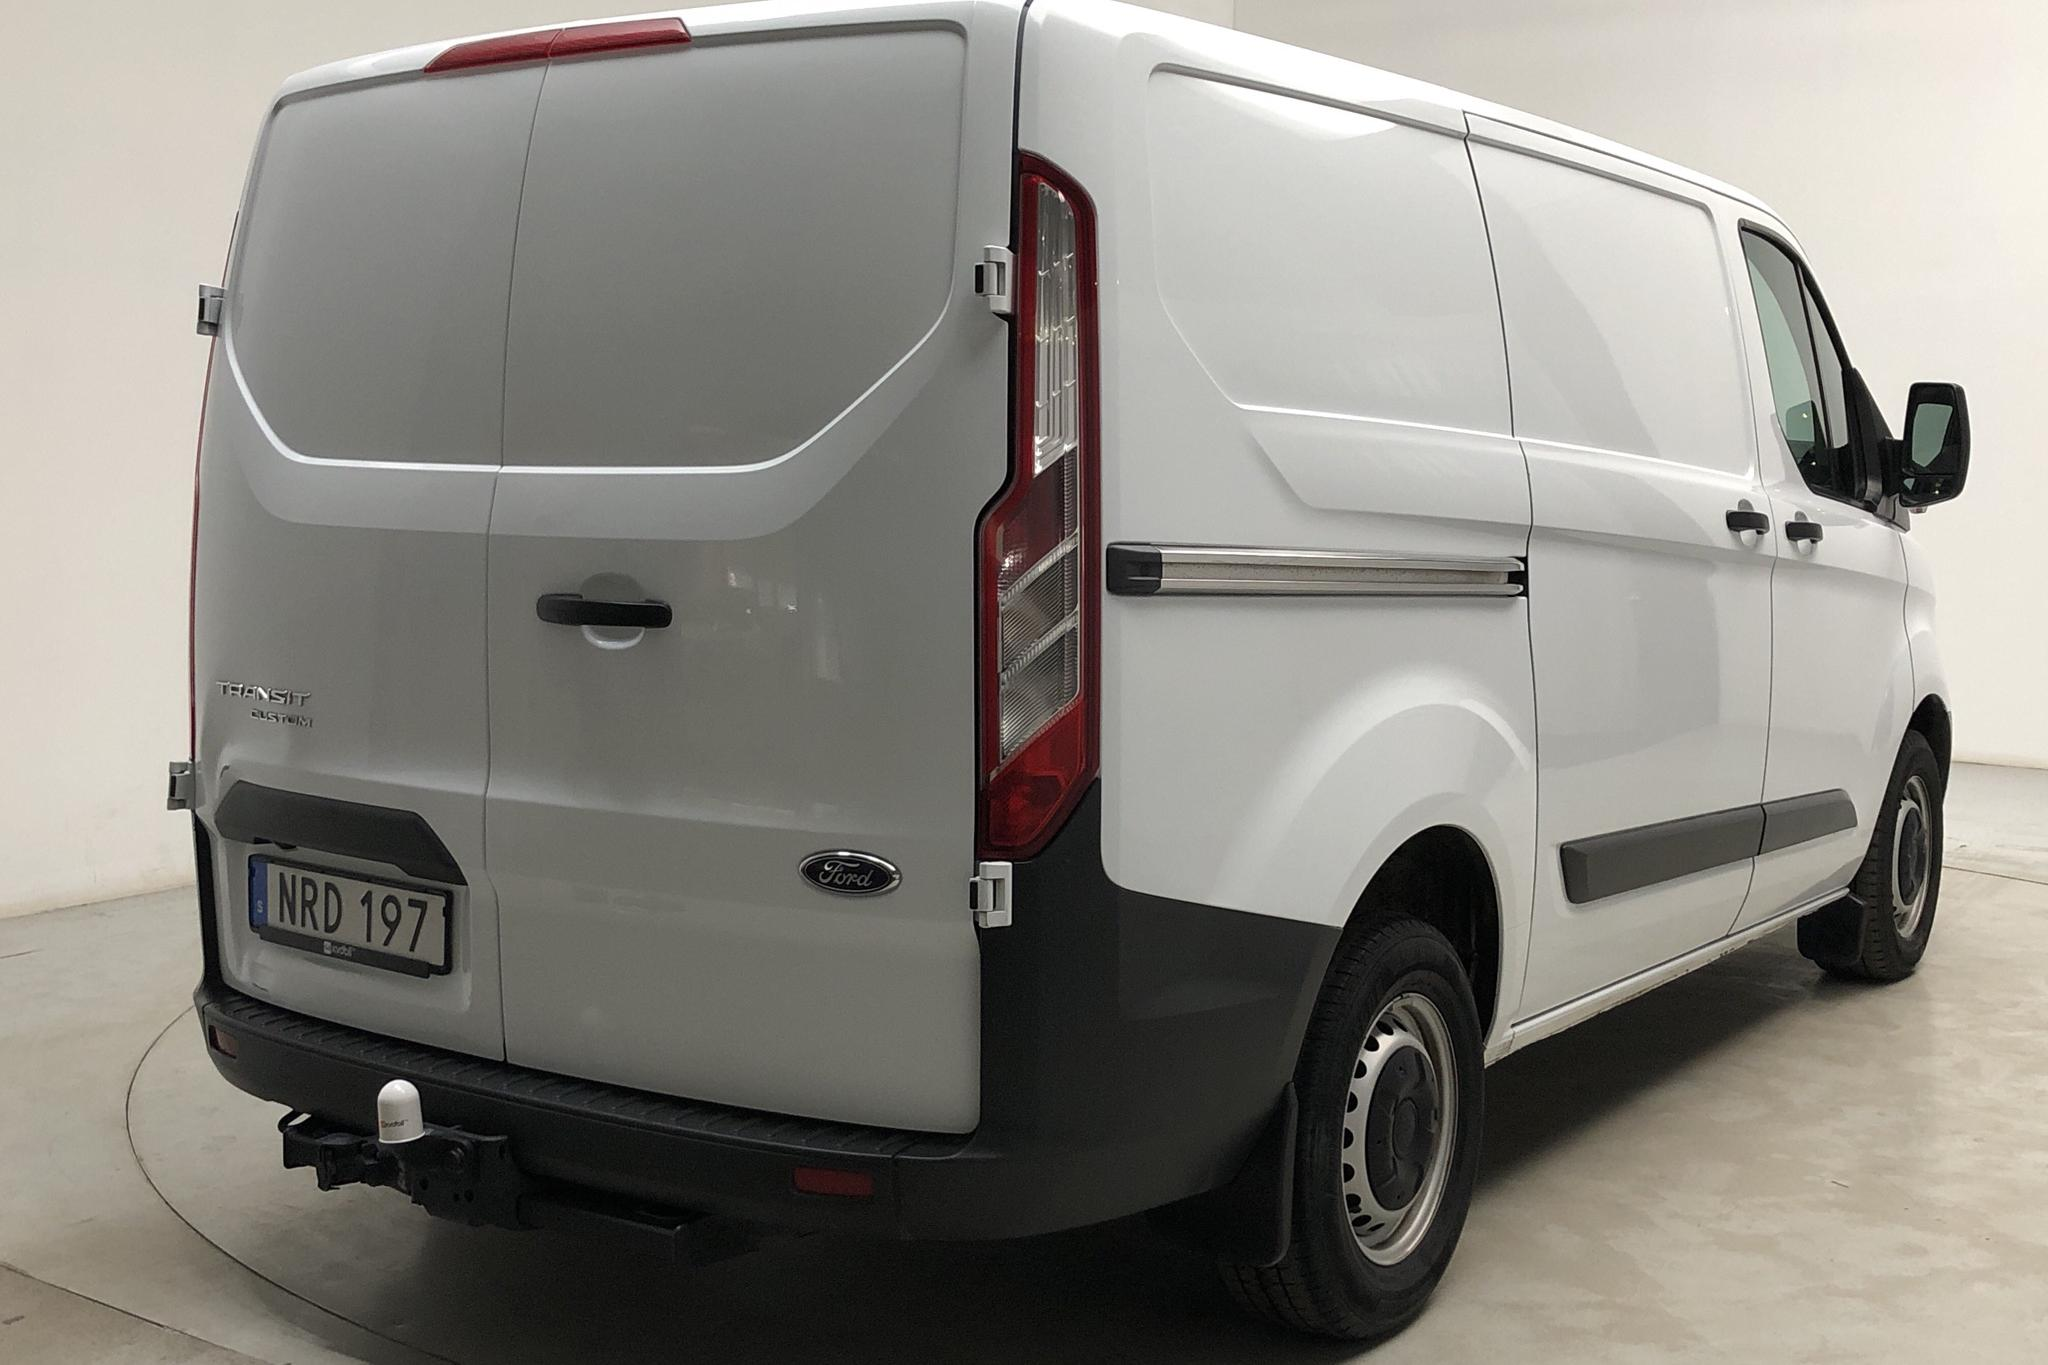 Ford Transit Custom 270 (100hk) - 75 300 km - Manual - white - 2015